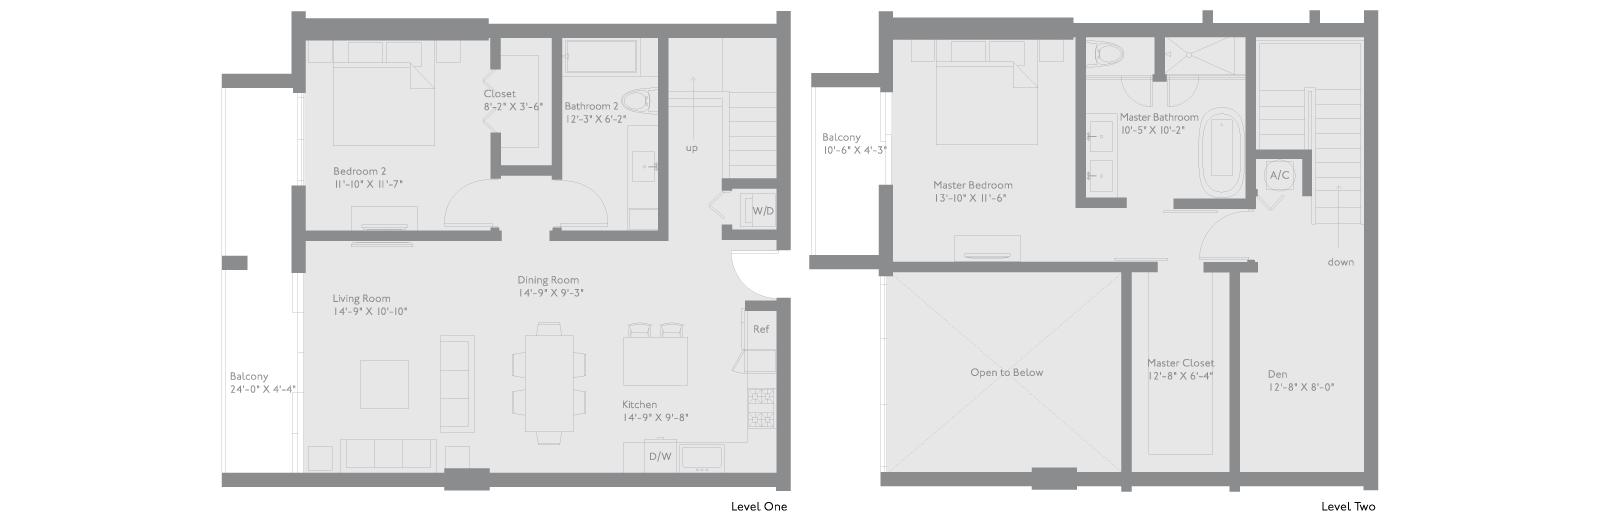 Arbor Floor Plan H 12 15 17